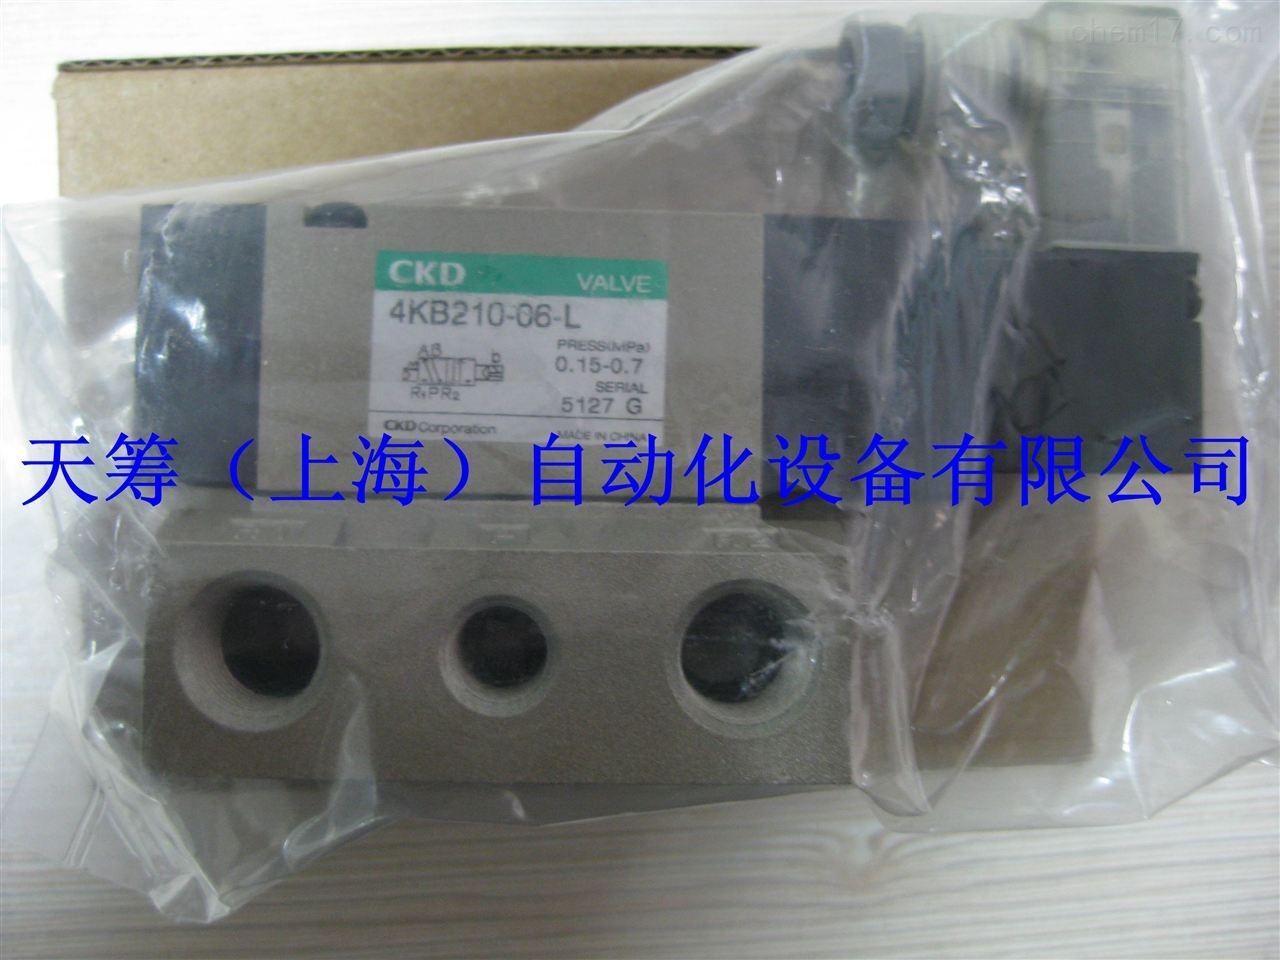 CKD流体阀4KB210-06-L